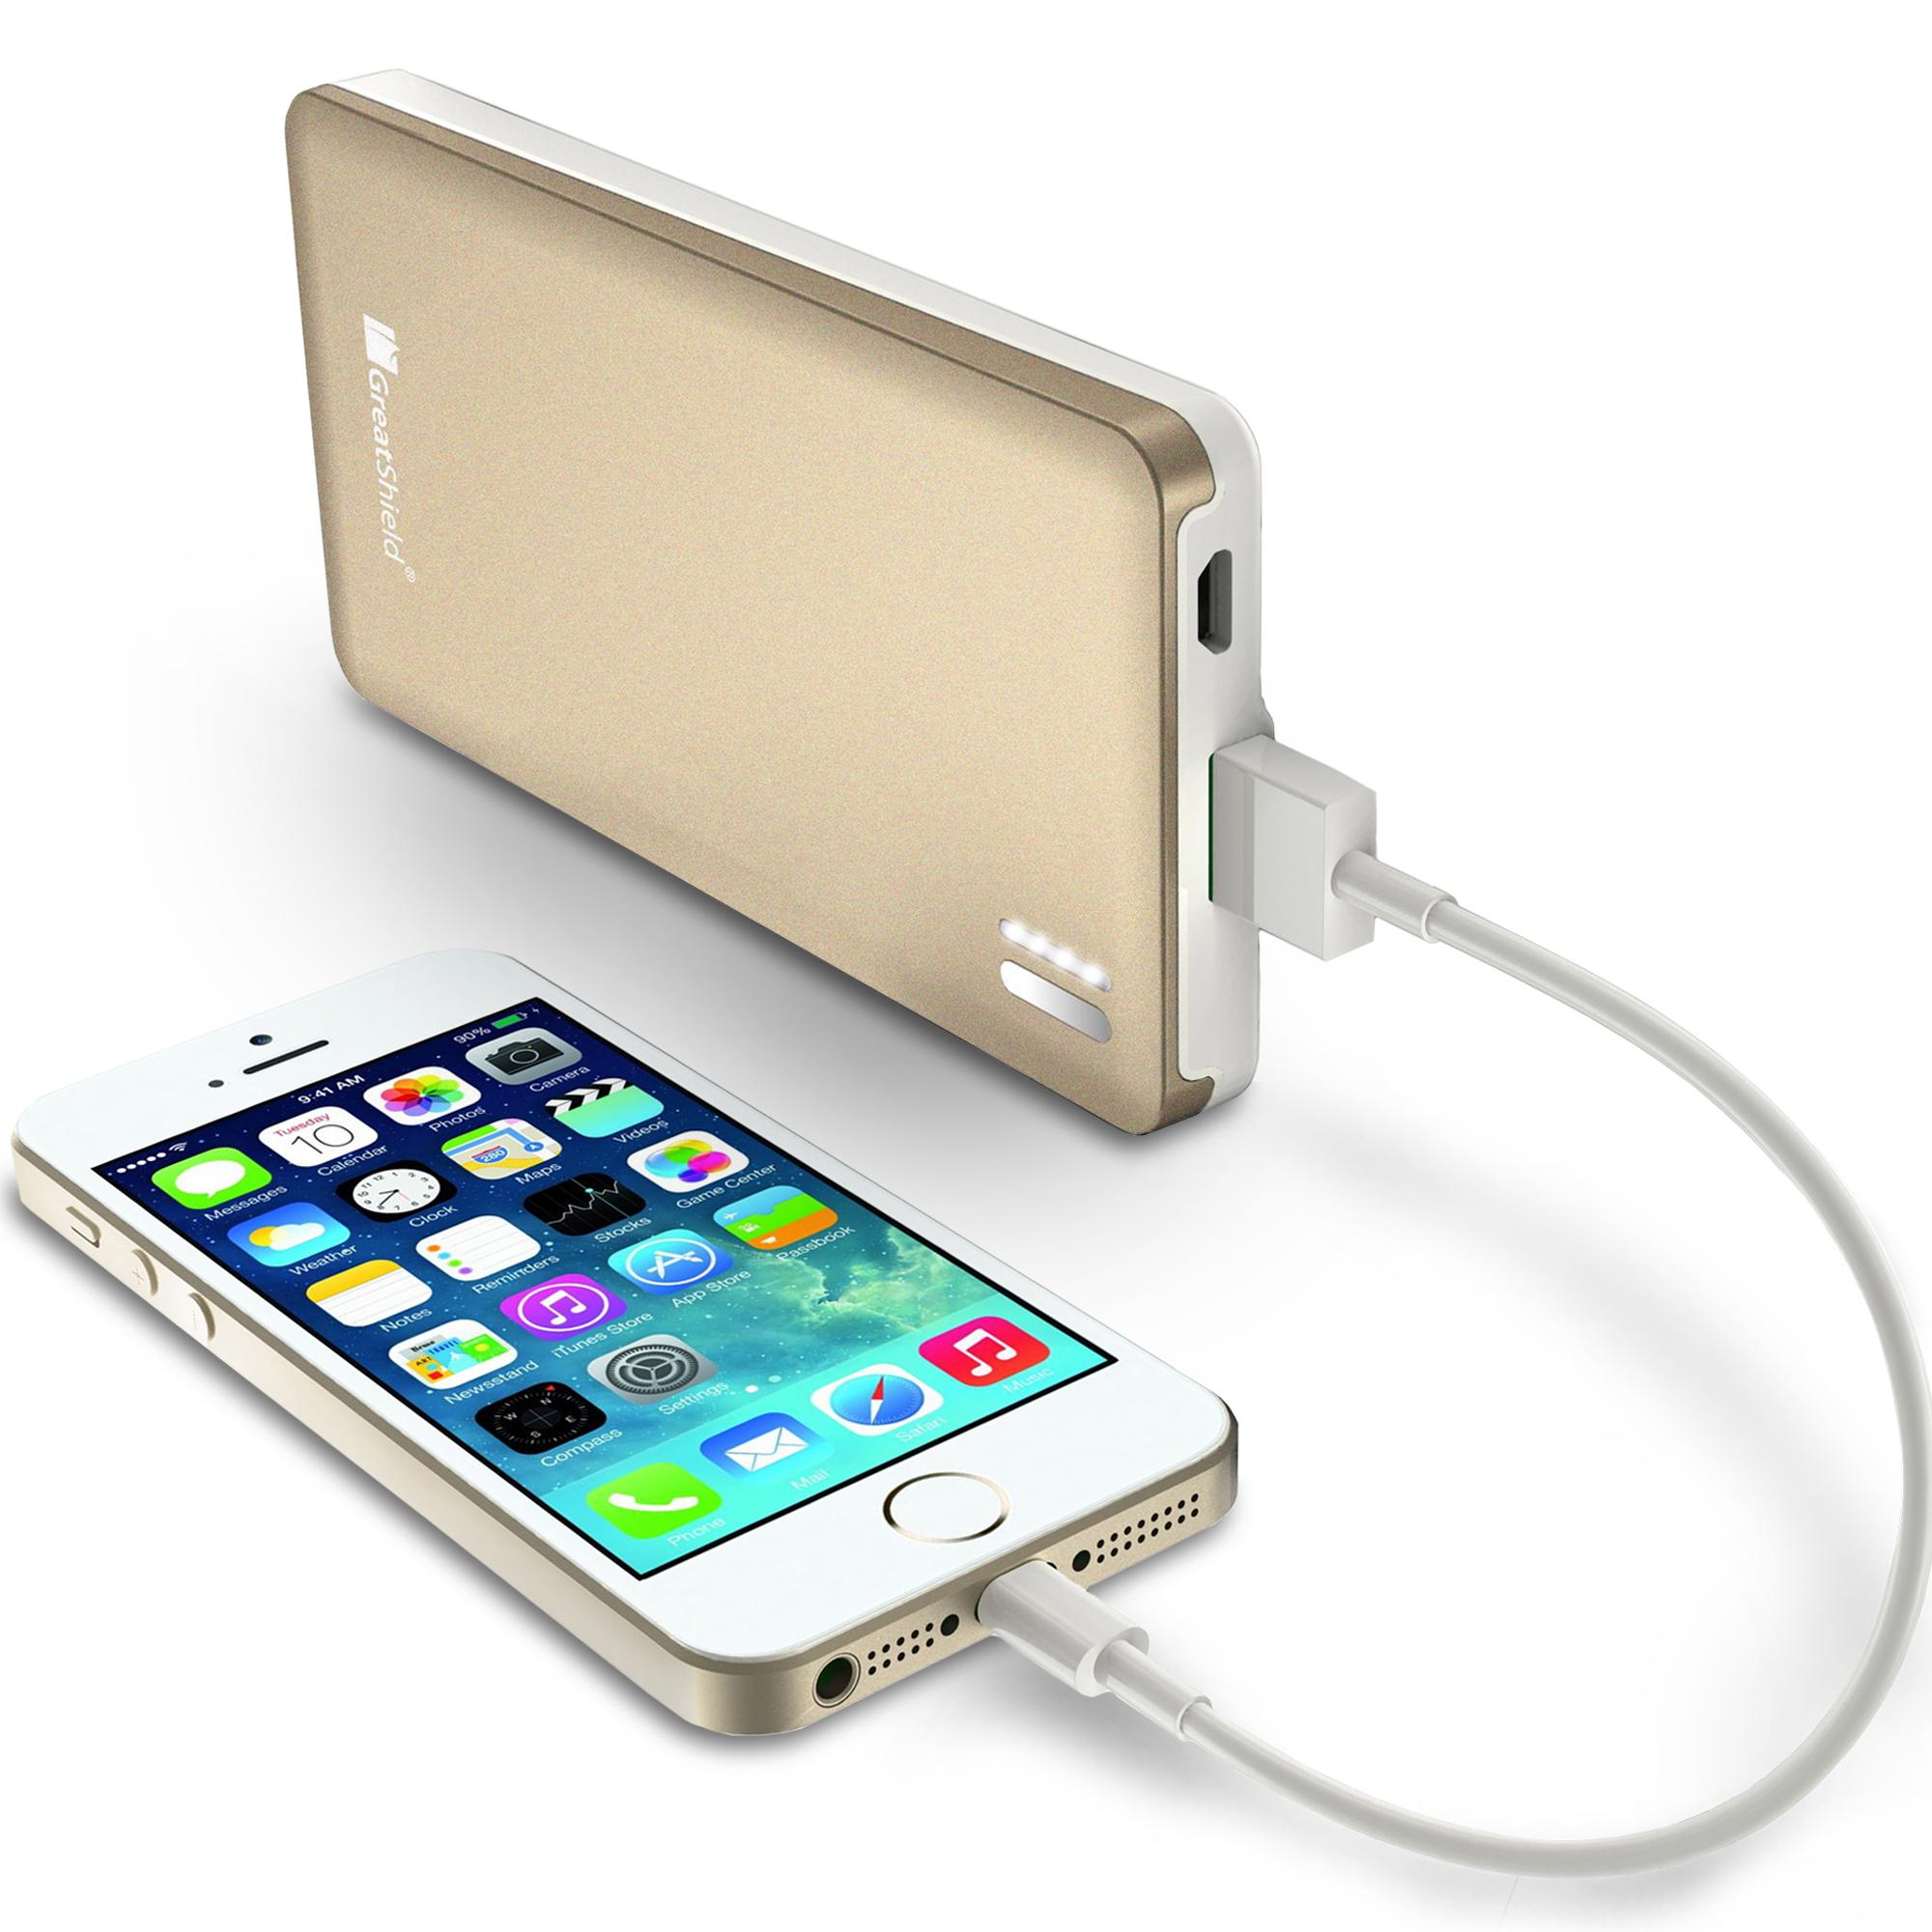 GreatShield 7000mAh PowerSleek Portable Battery Charger - Titanium  Gray/White - GreatShield